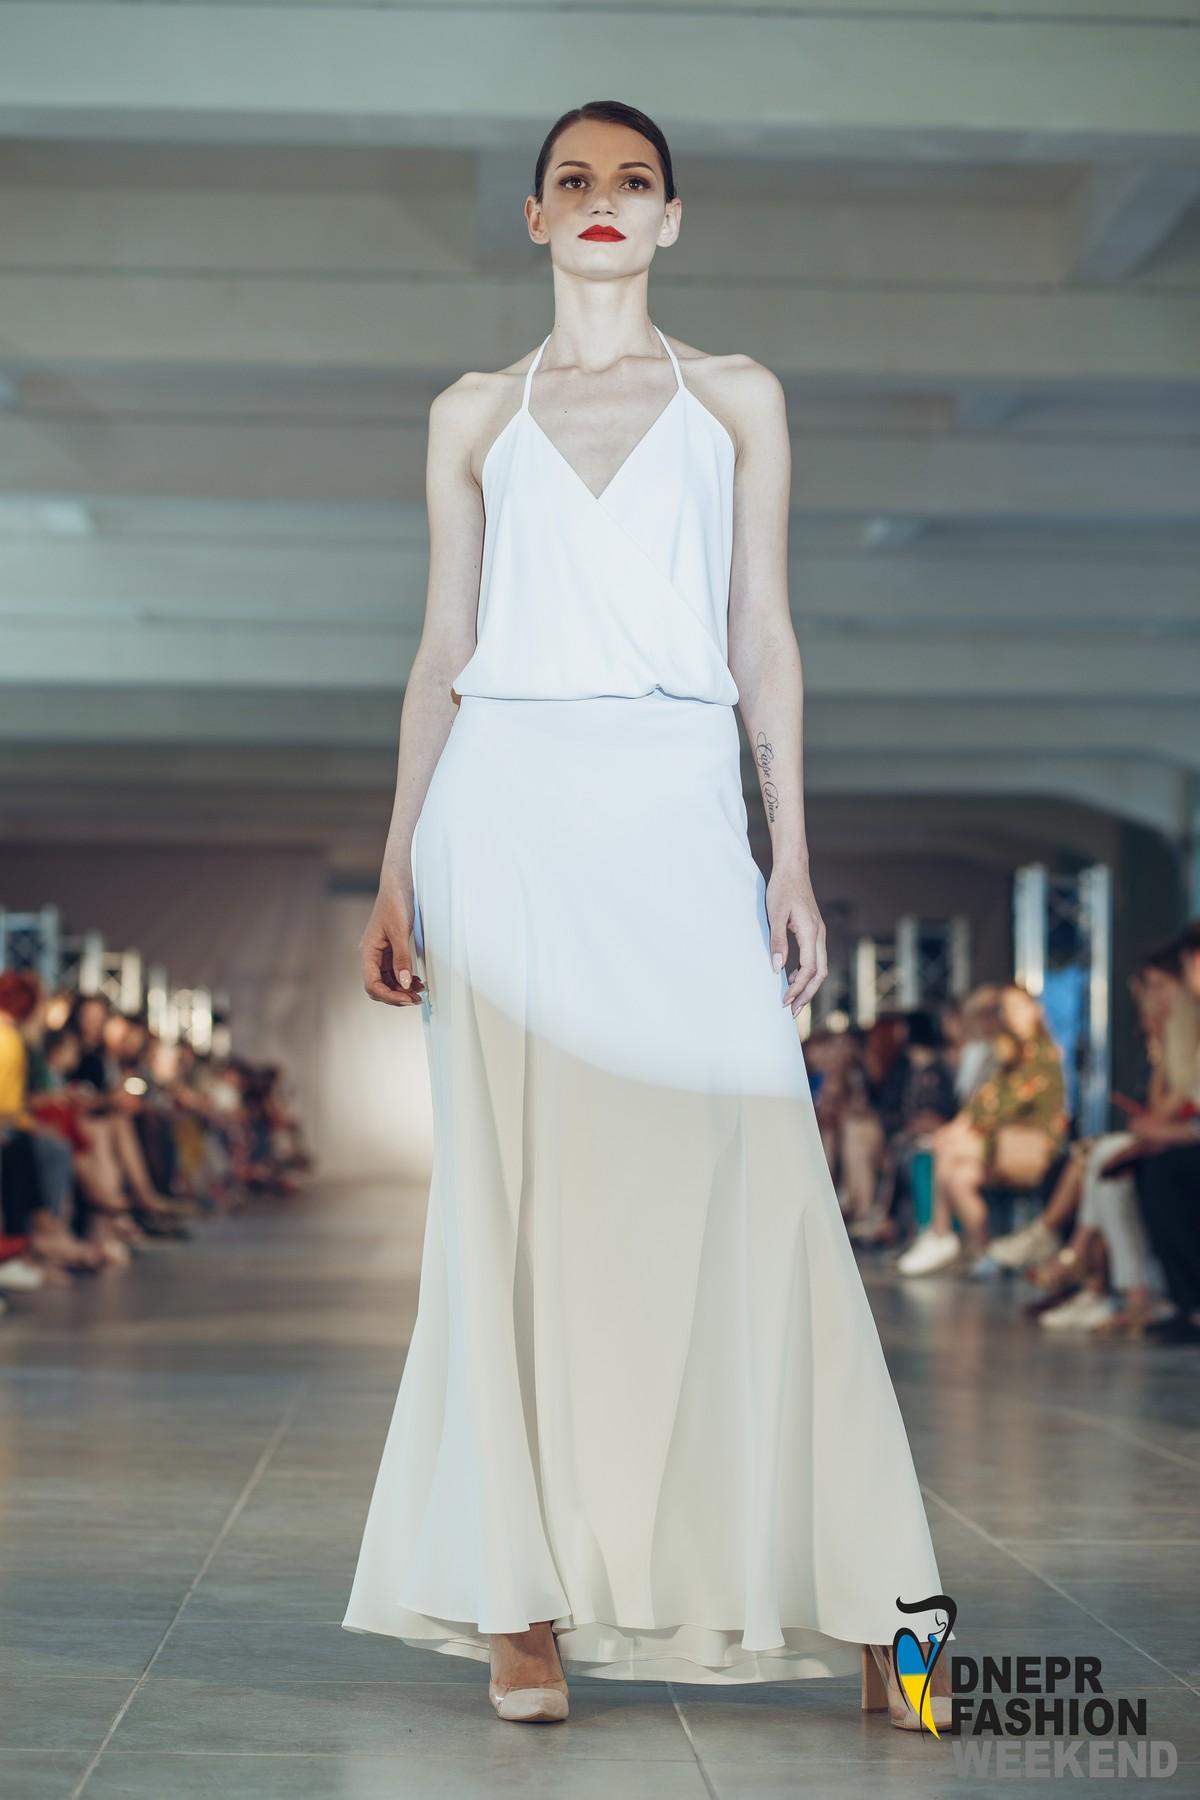 Хроники Dnepr Fashion Weekend как прошли три дня модного мероприятия 25